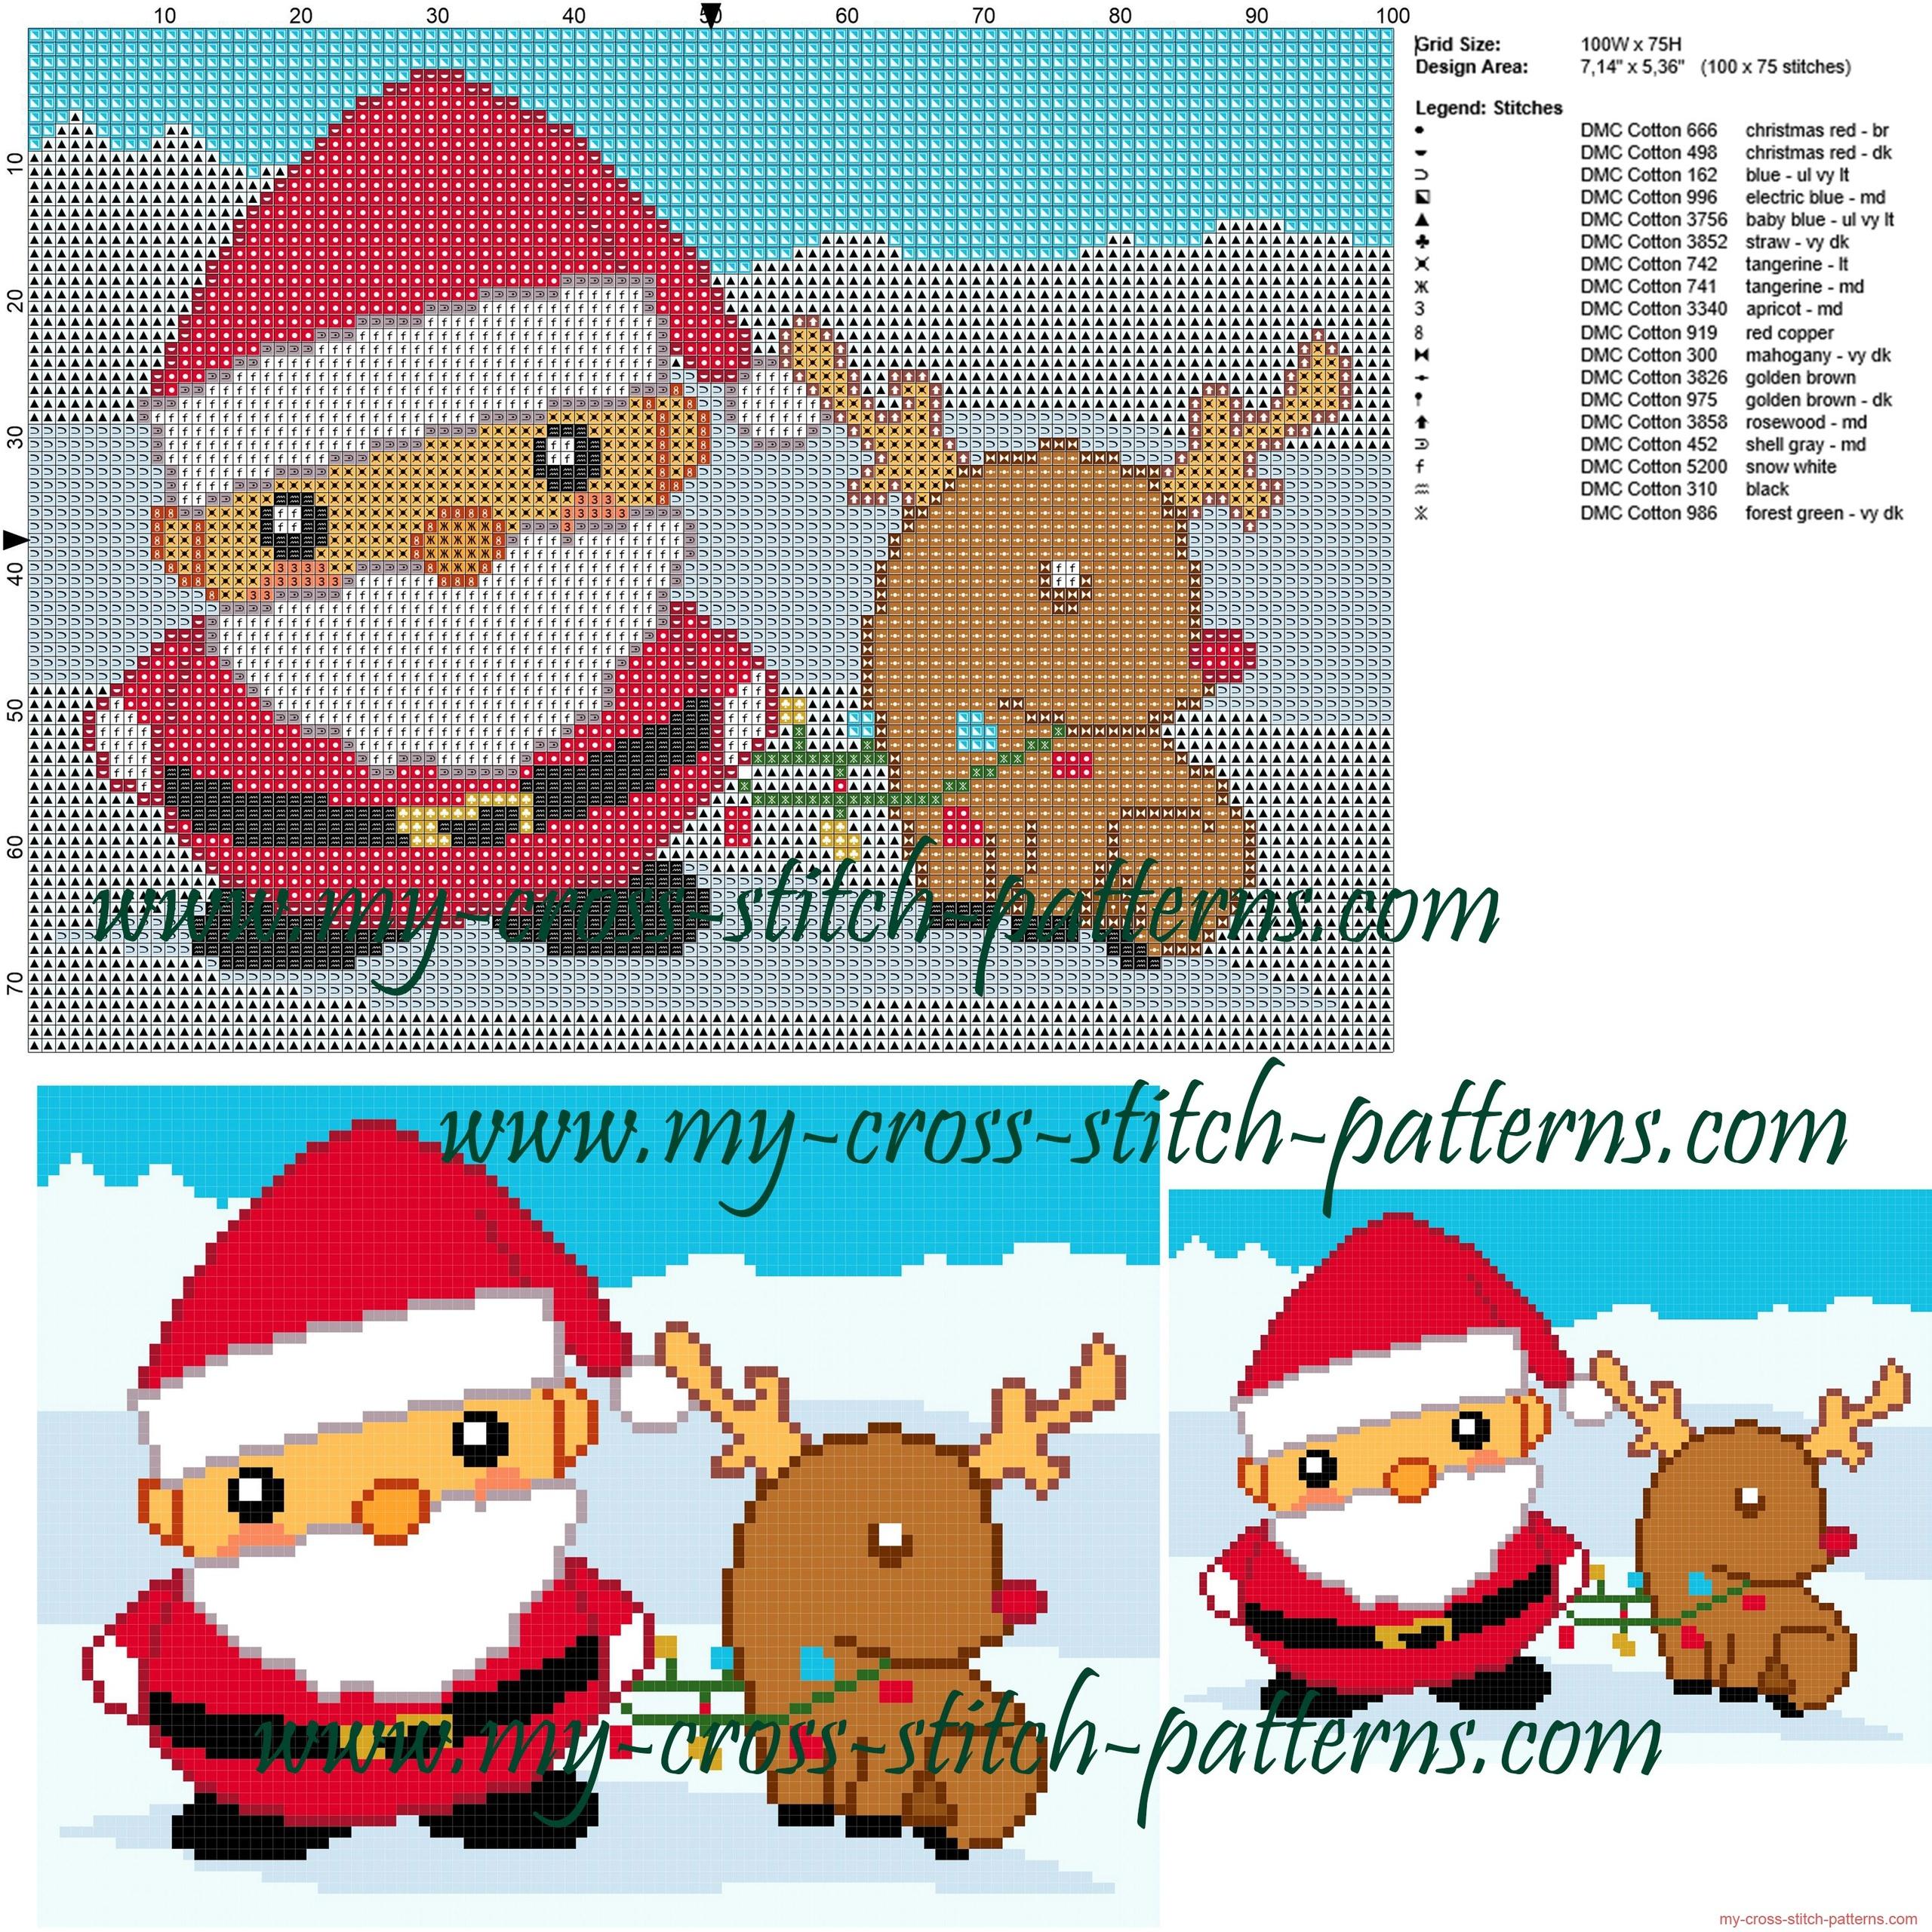 santa_claus_cross_stitch_pattern__2